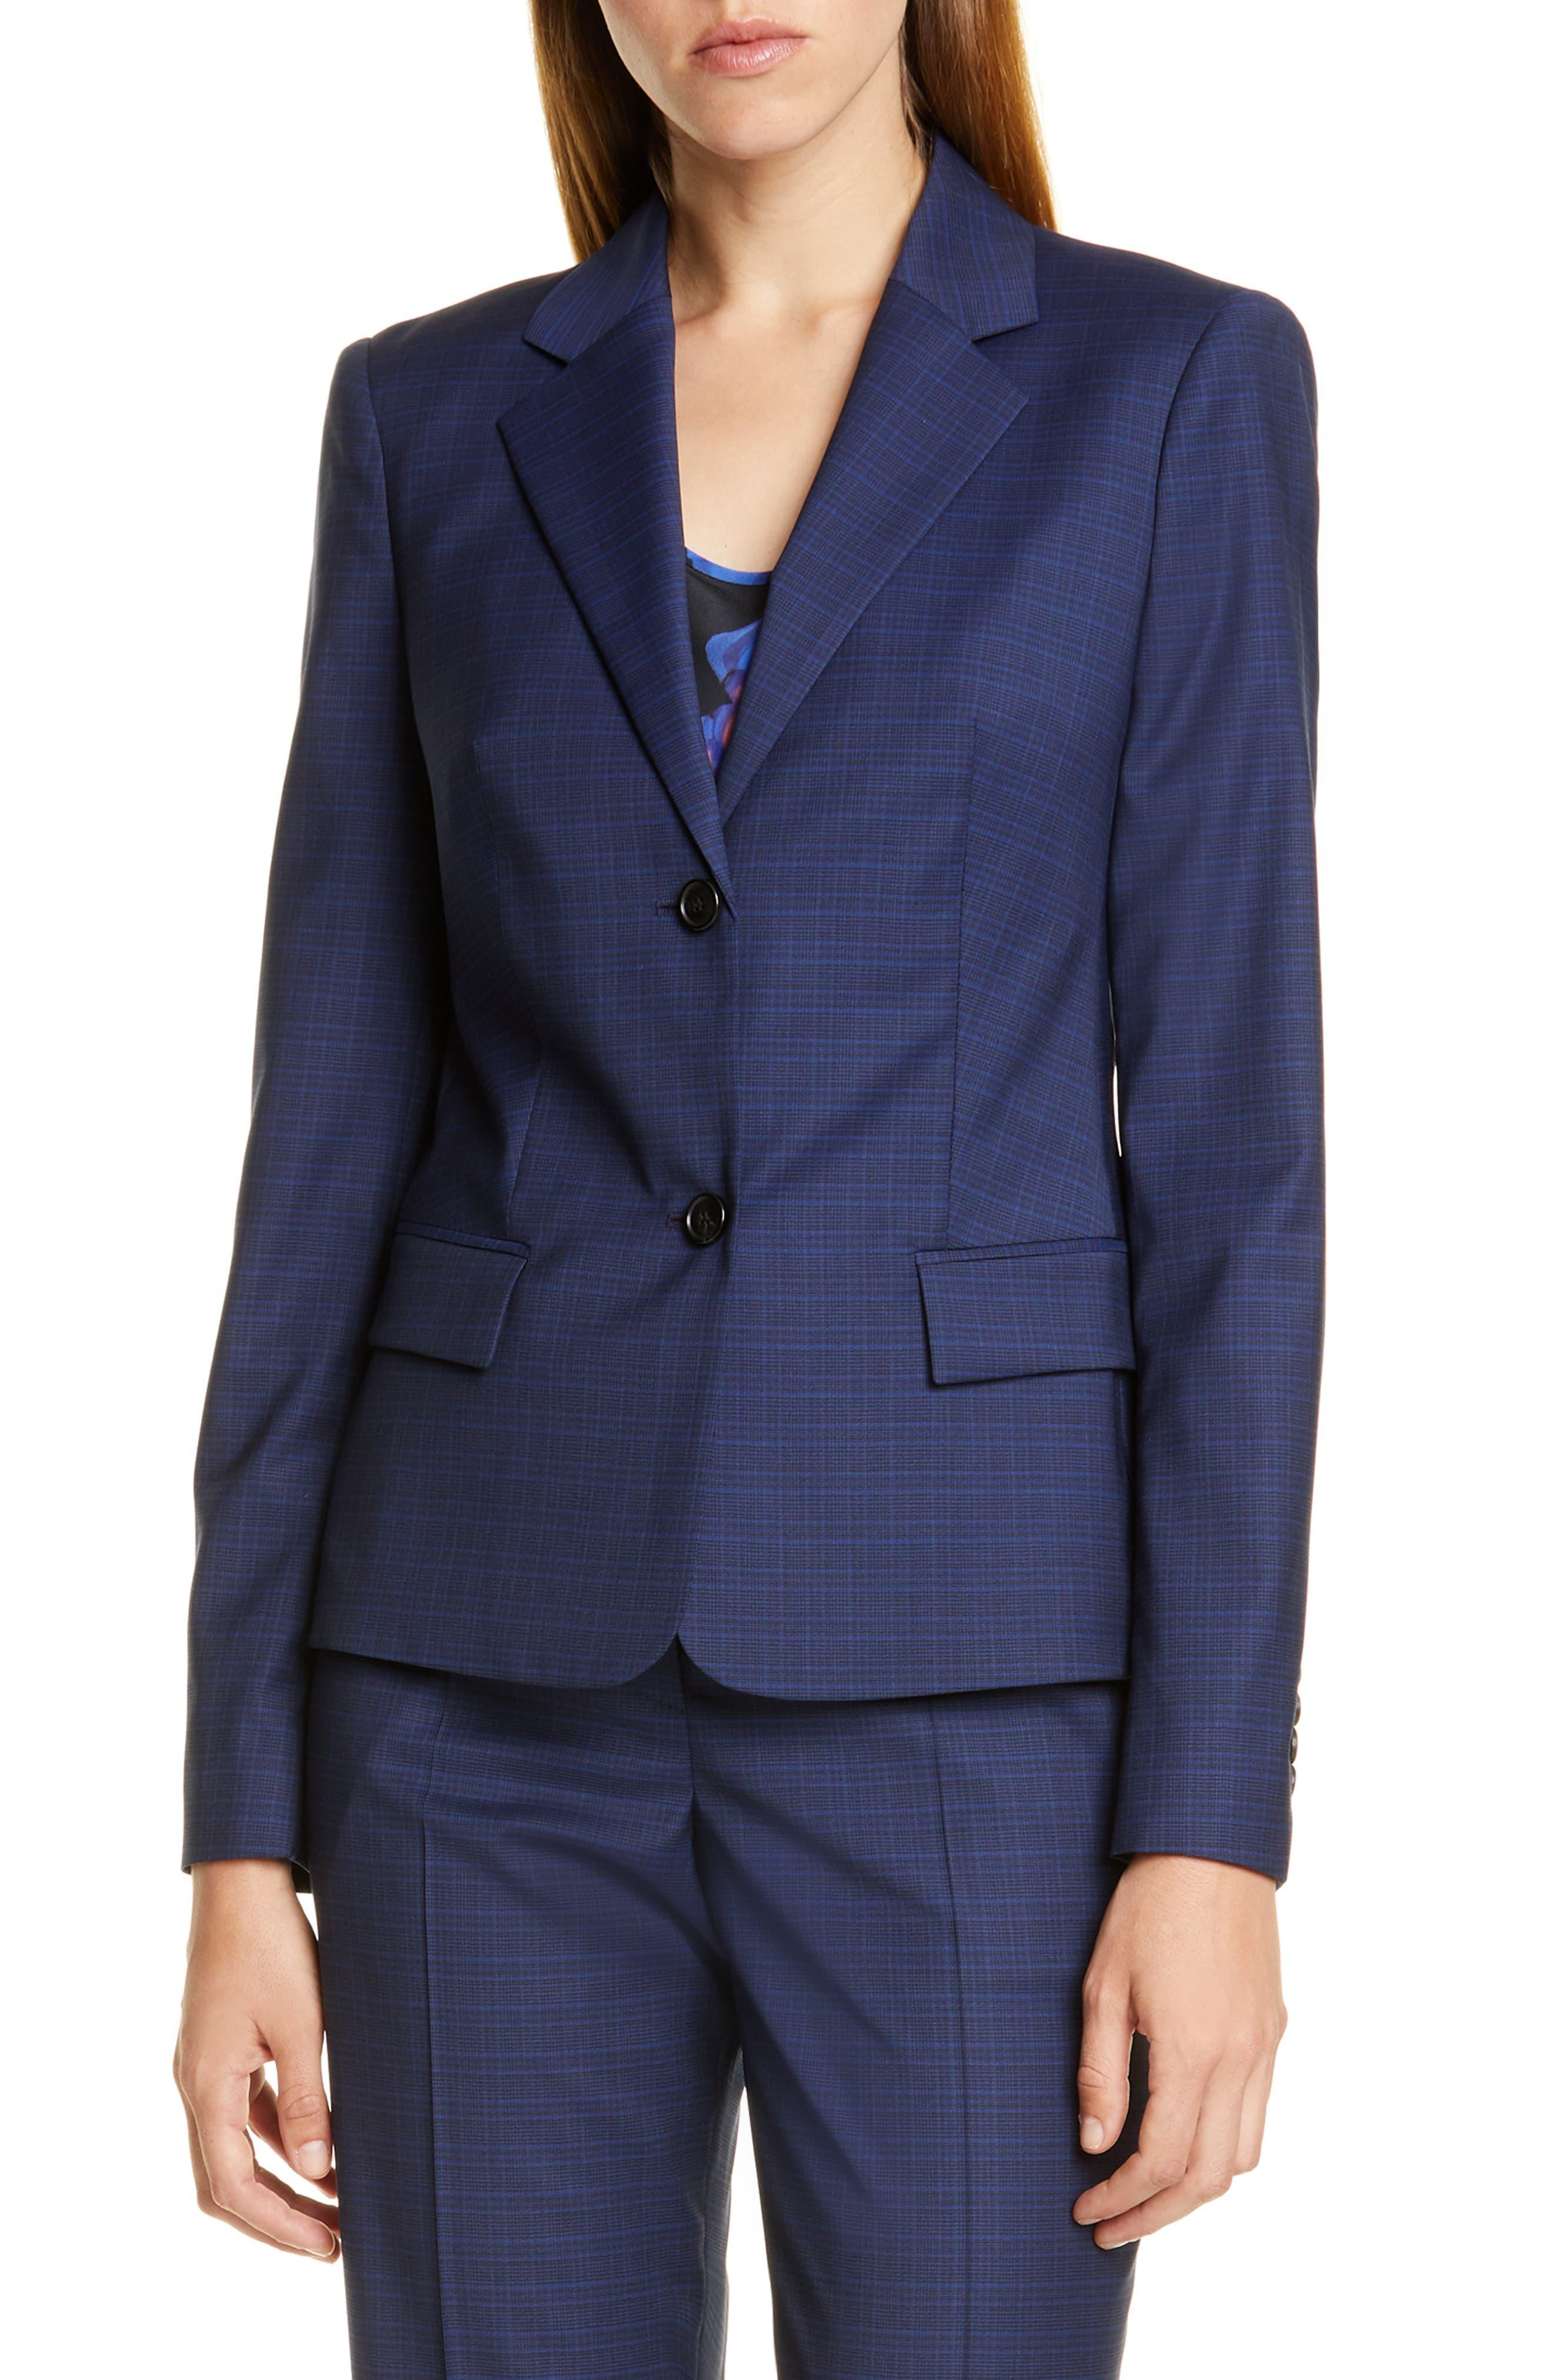 BOSS Jarana Rich Check Wool Suit Jacket (Regular & Petite)